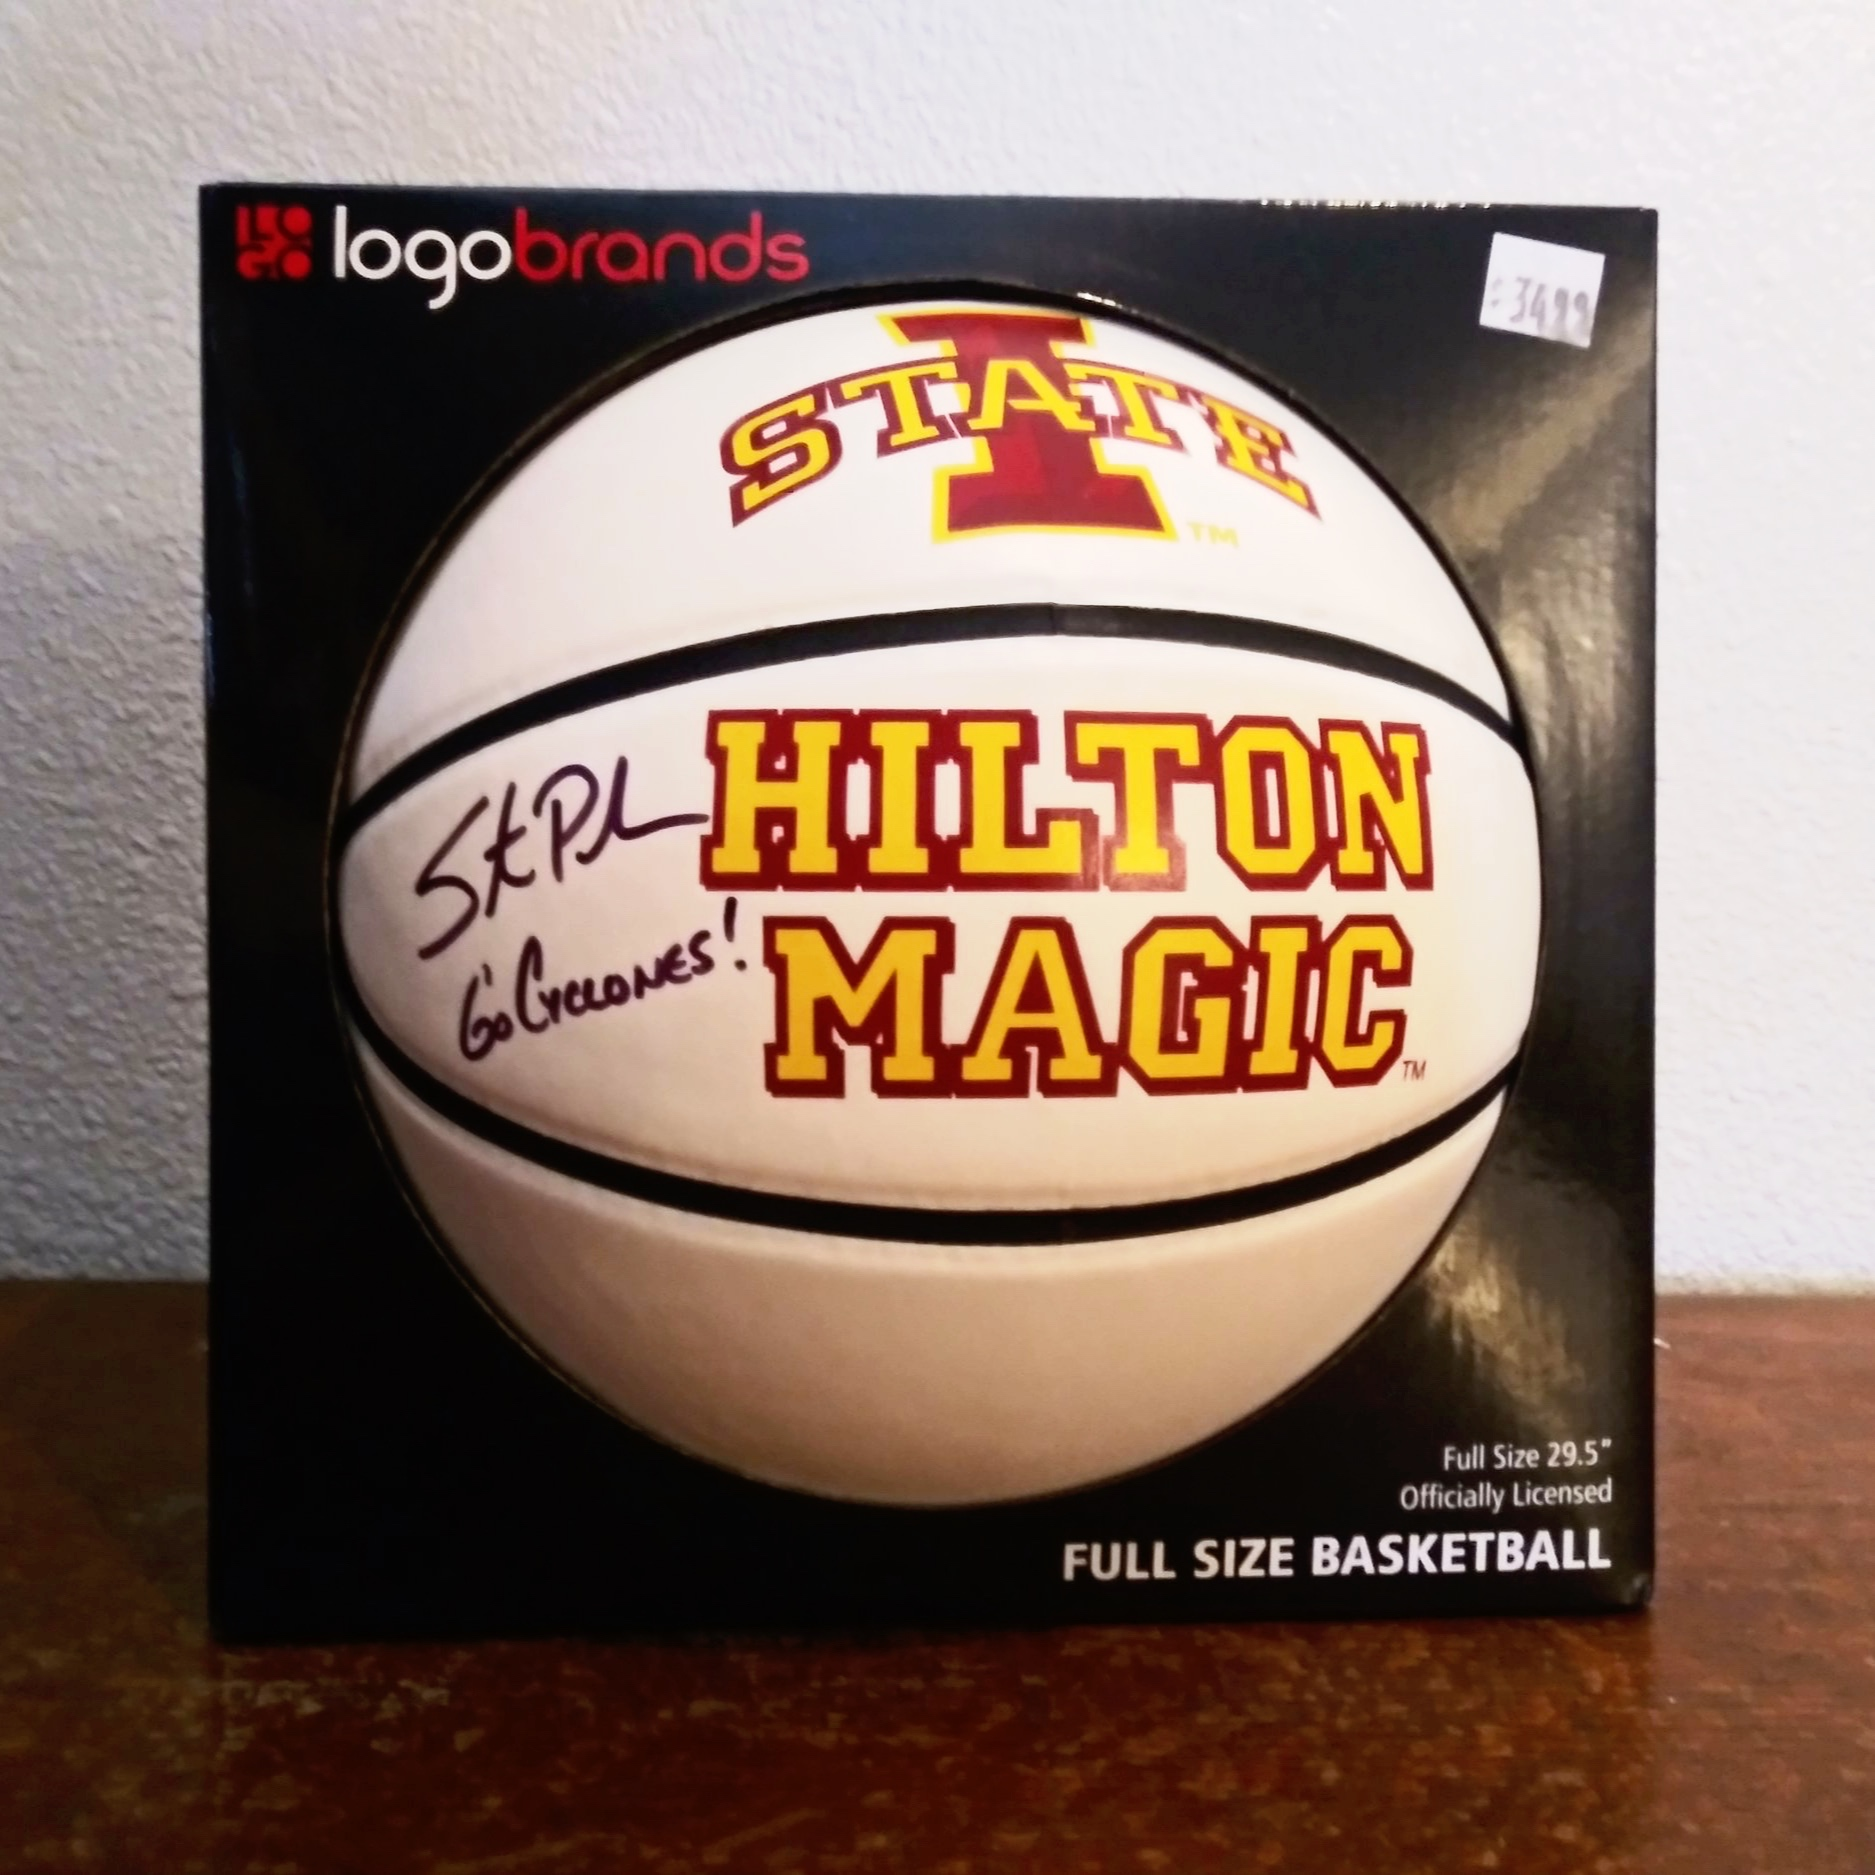 Hilton+Magic+Basketball+signed+by+ISU+Coach+Steve+Prohm